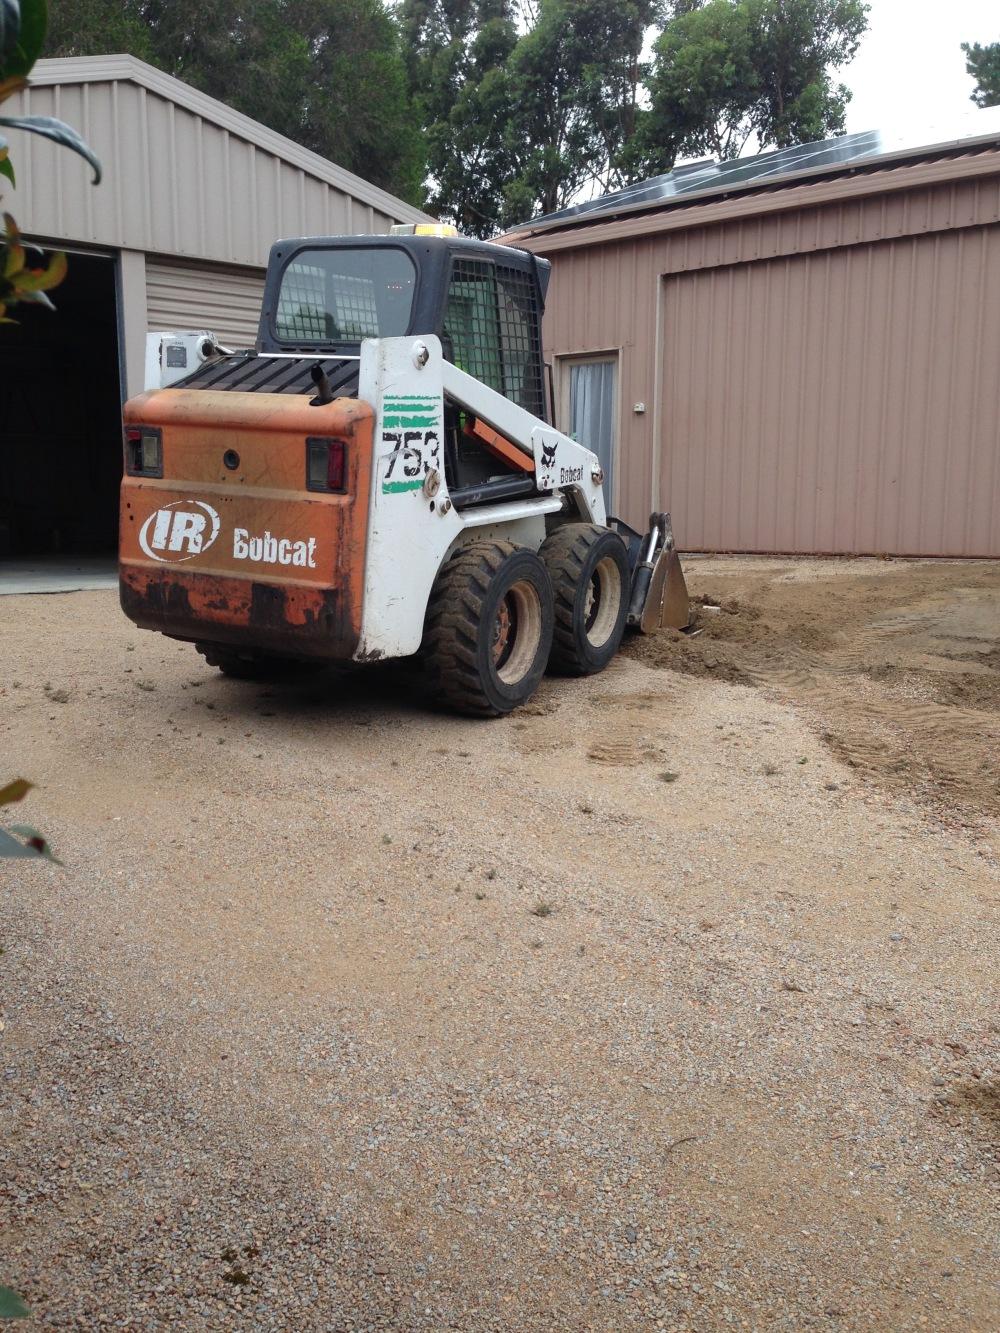 renewing the driveway